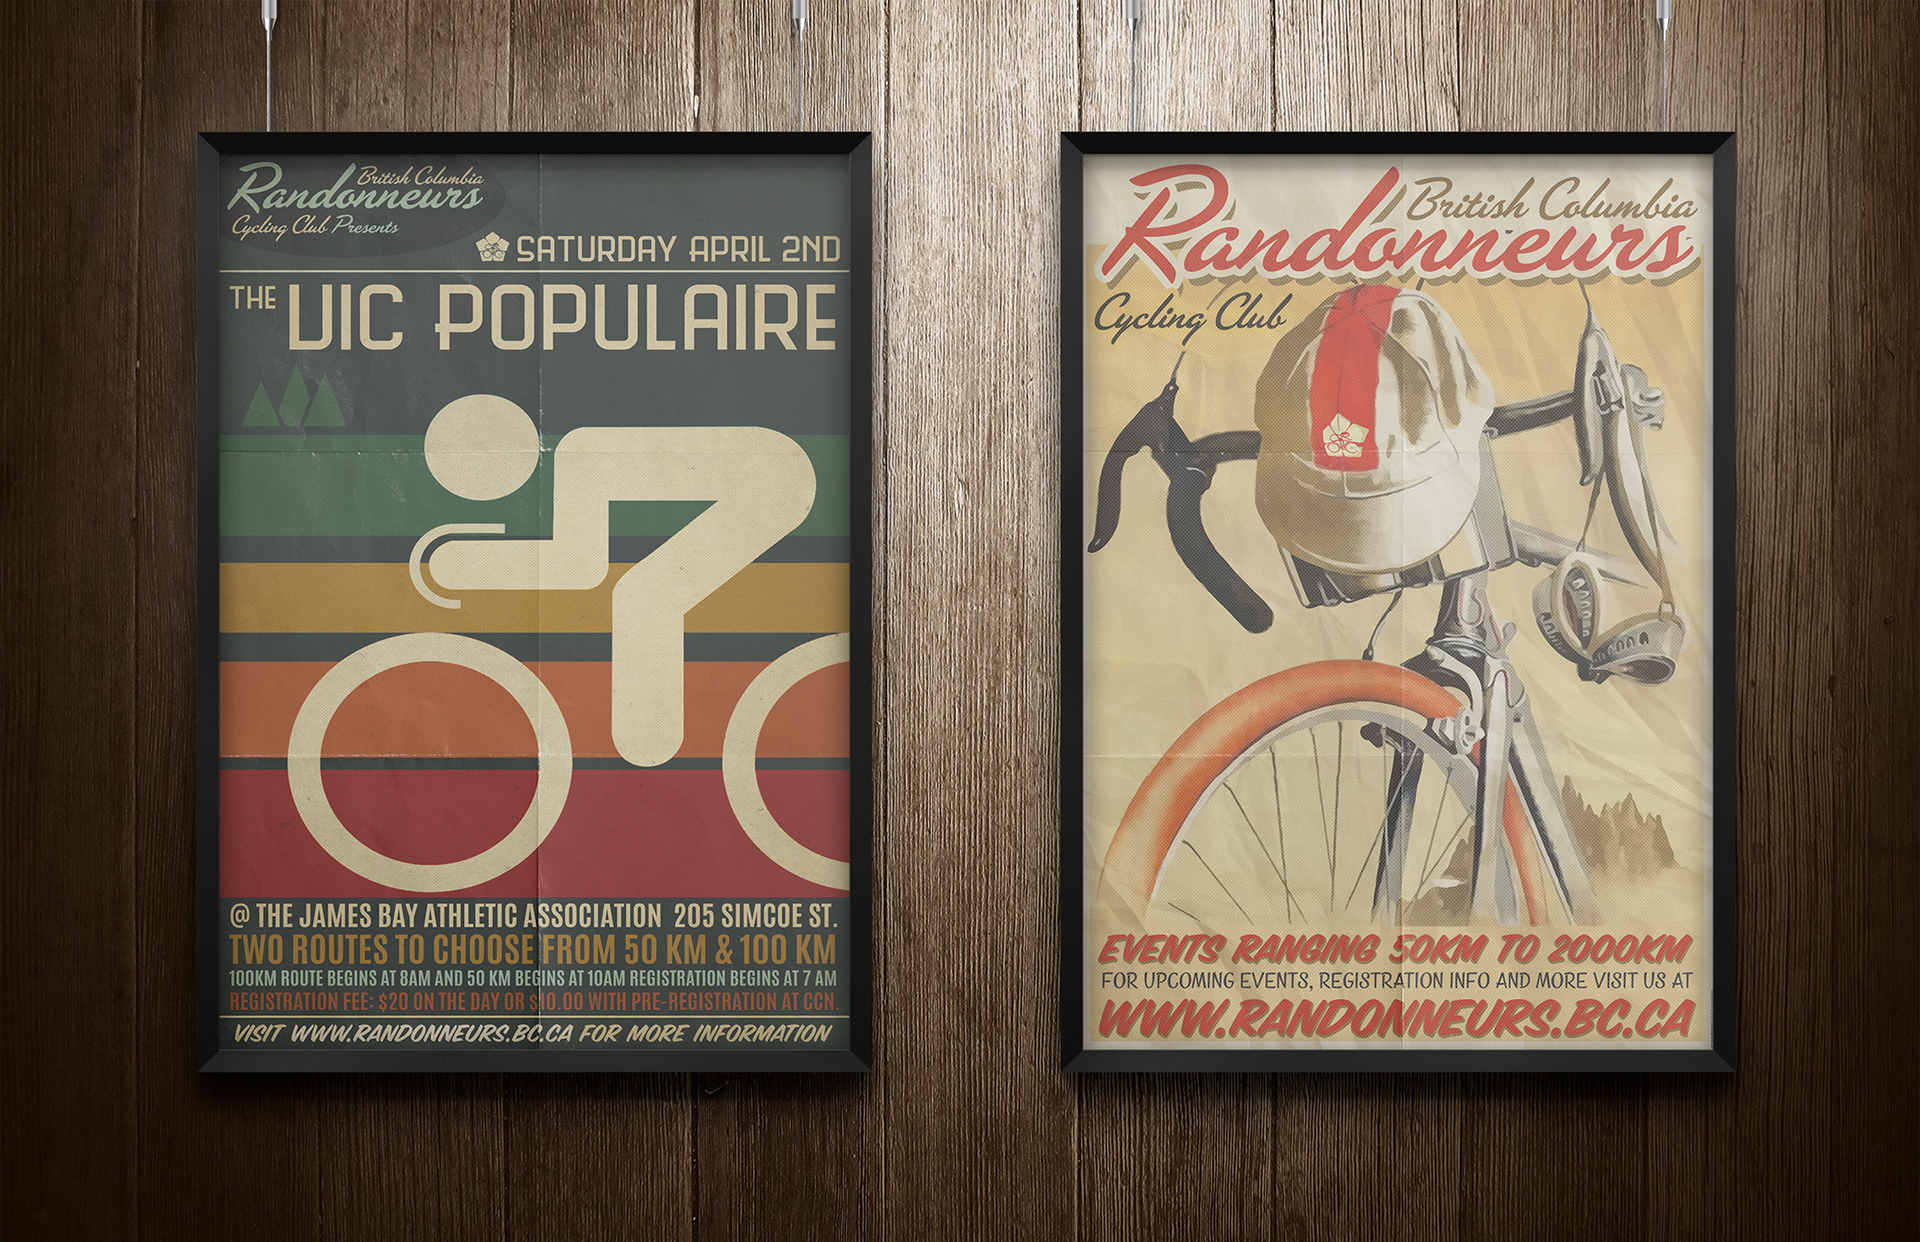 Proster Designs: British Columbia Randonneurs